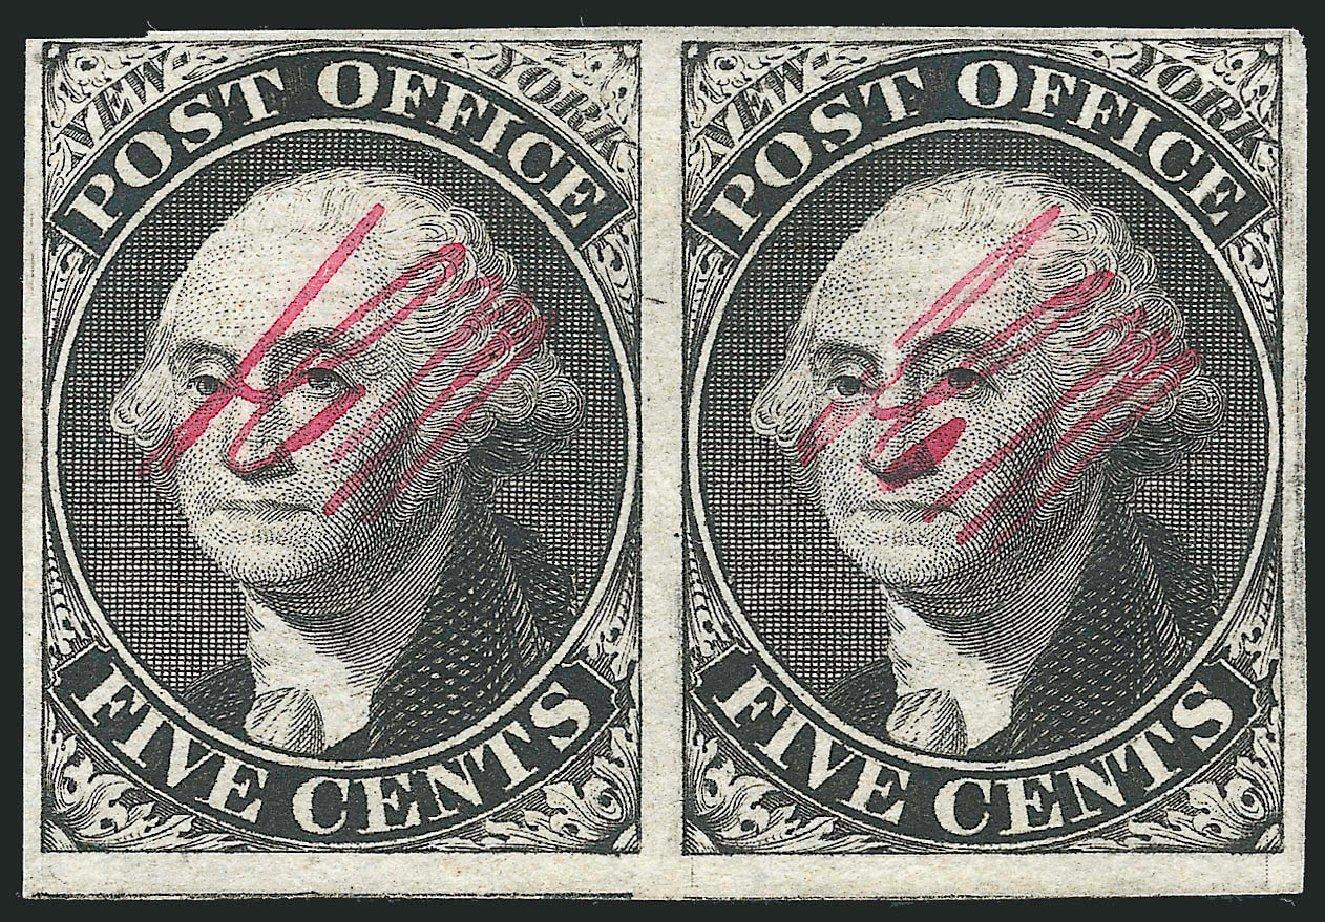 Prices of US Stamp Scott Catalog 9X1: 1846 5c New York Postmasters Provisional. Robert Siegel Auction Galleries, Dec 2014, Sale 1090, Lot 1087